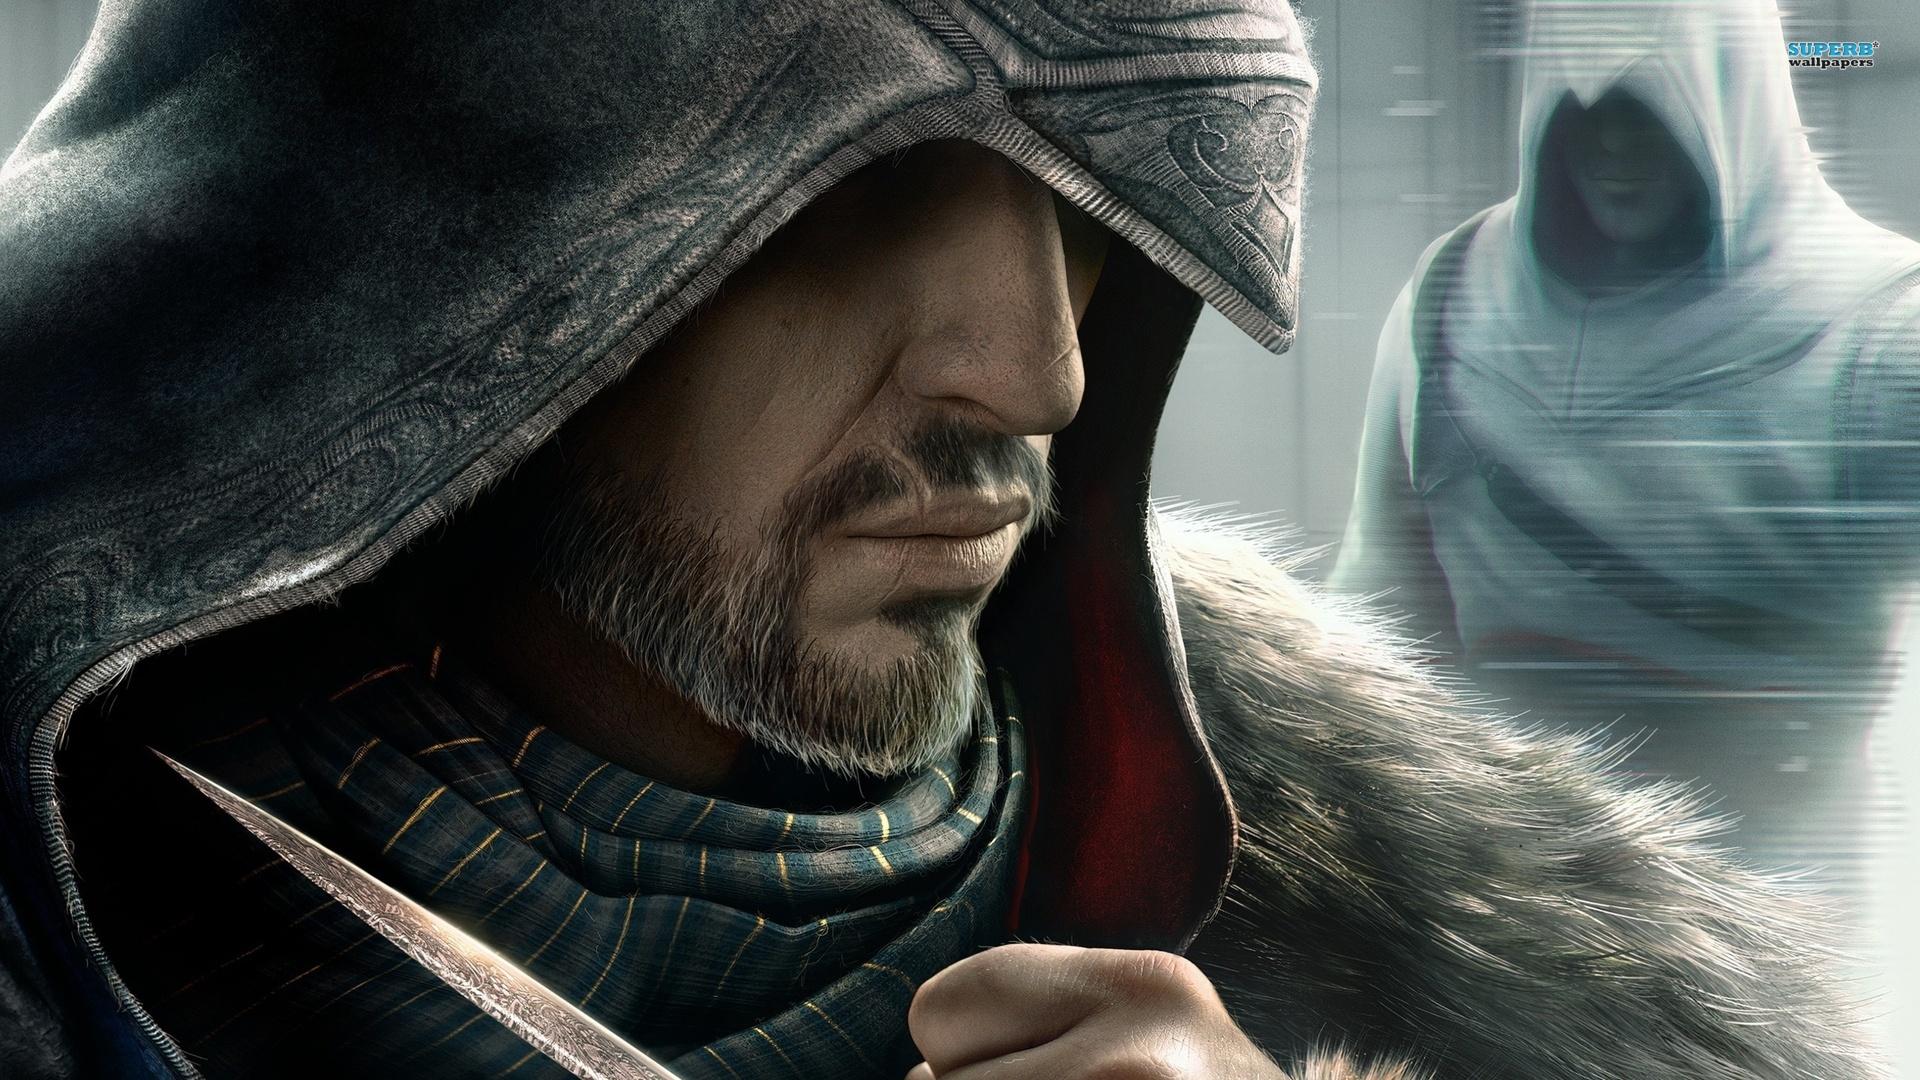 Assassins Creed Revelations full hd wallpapers 1080p 1920x1080